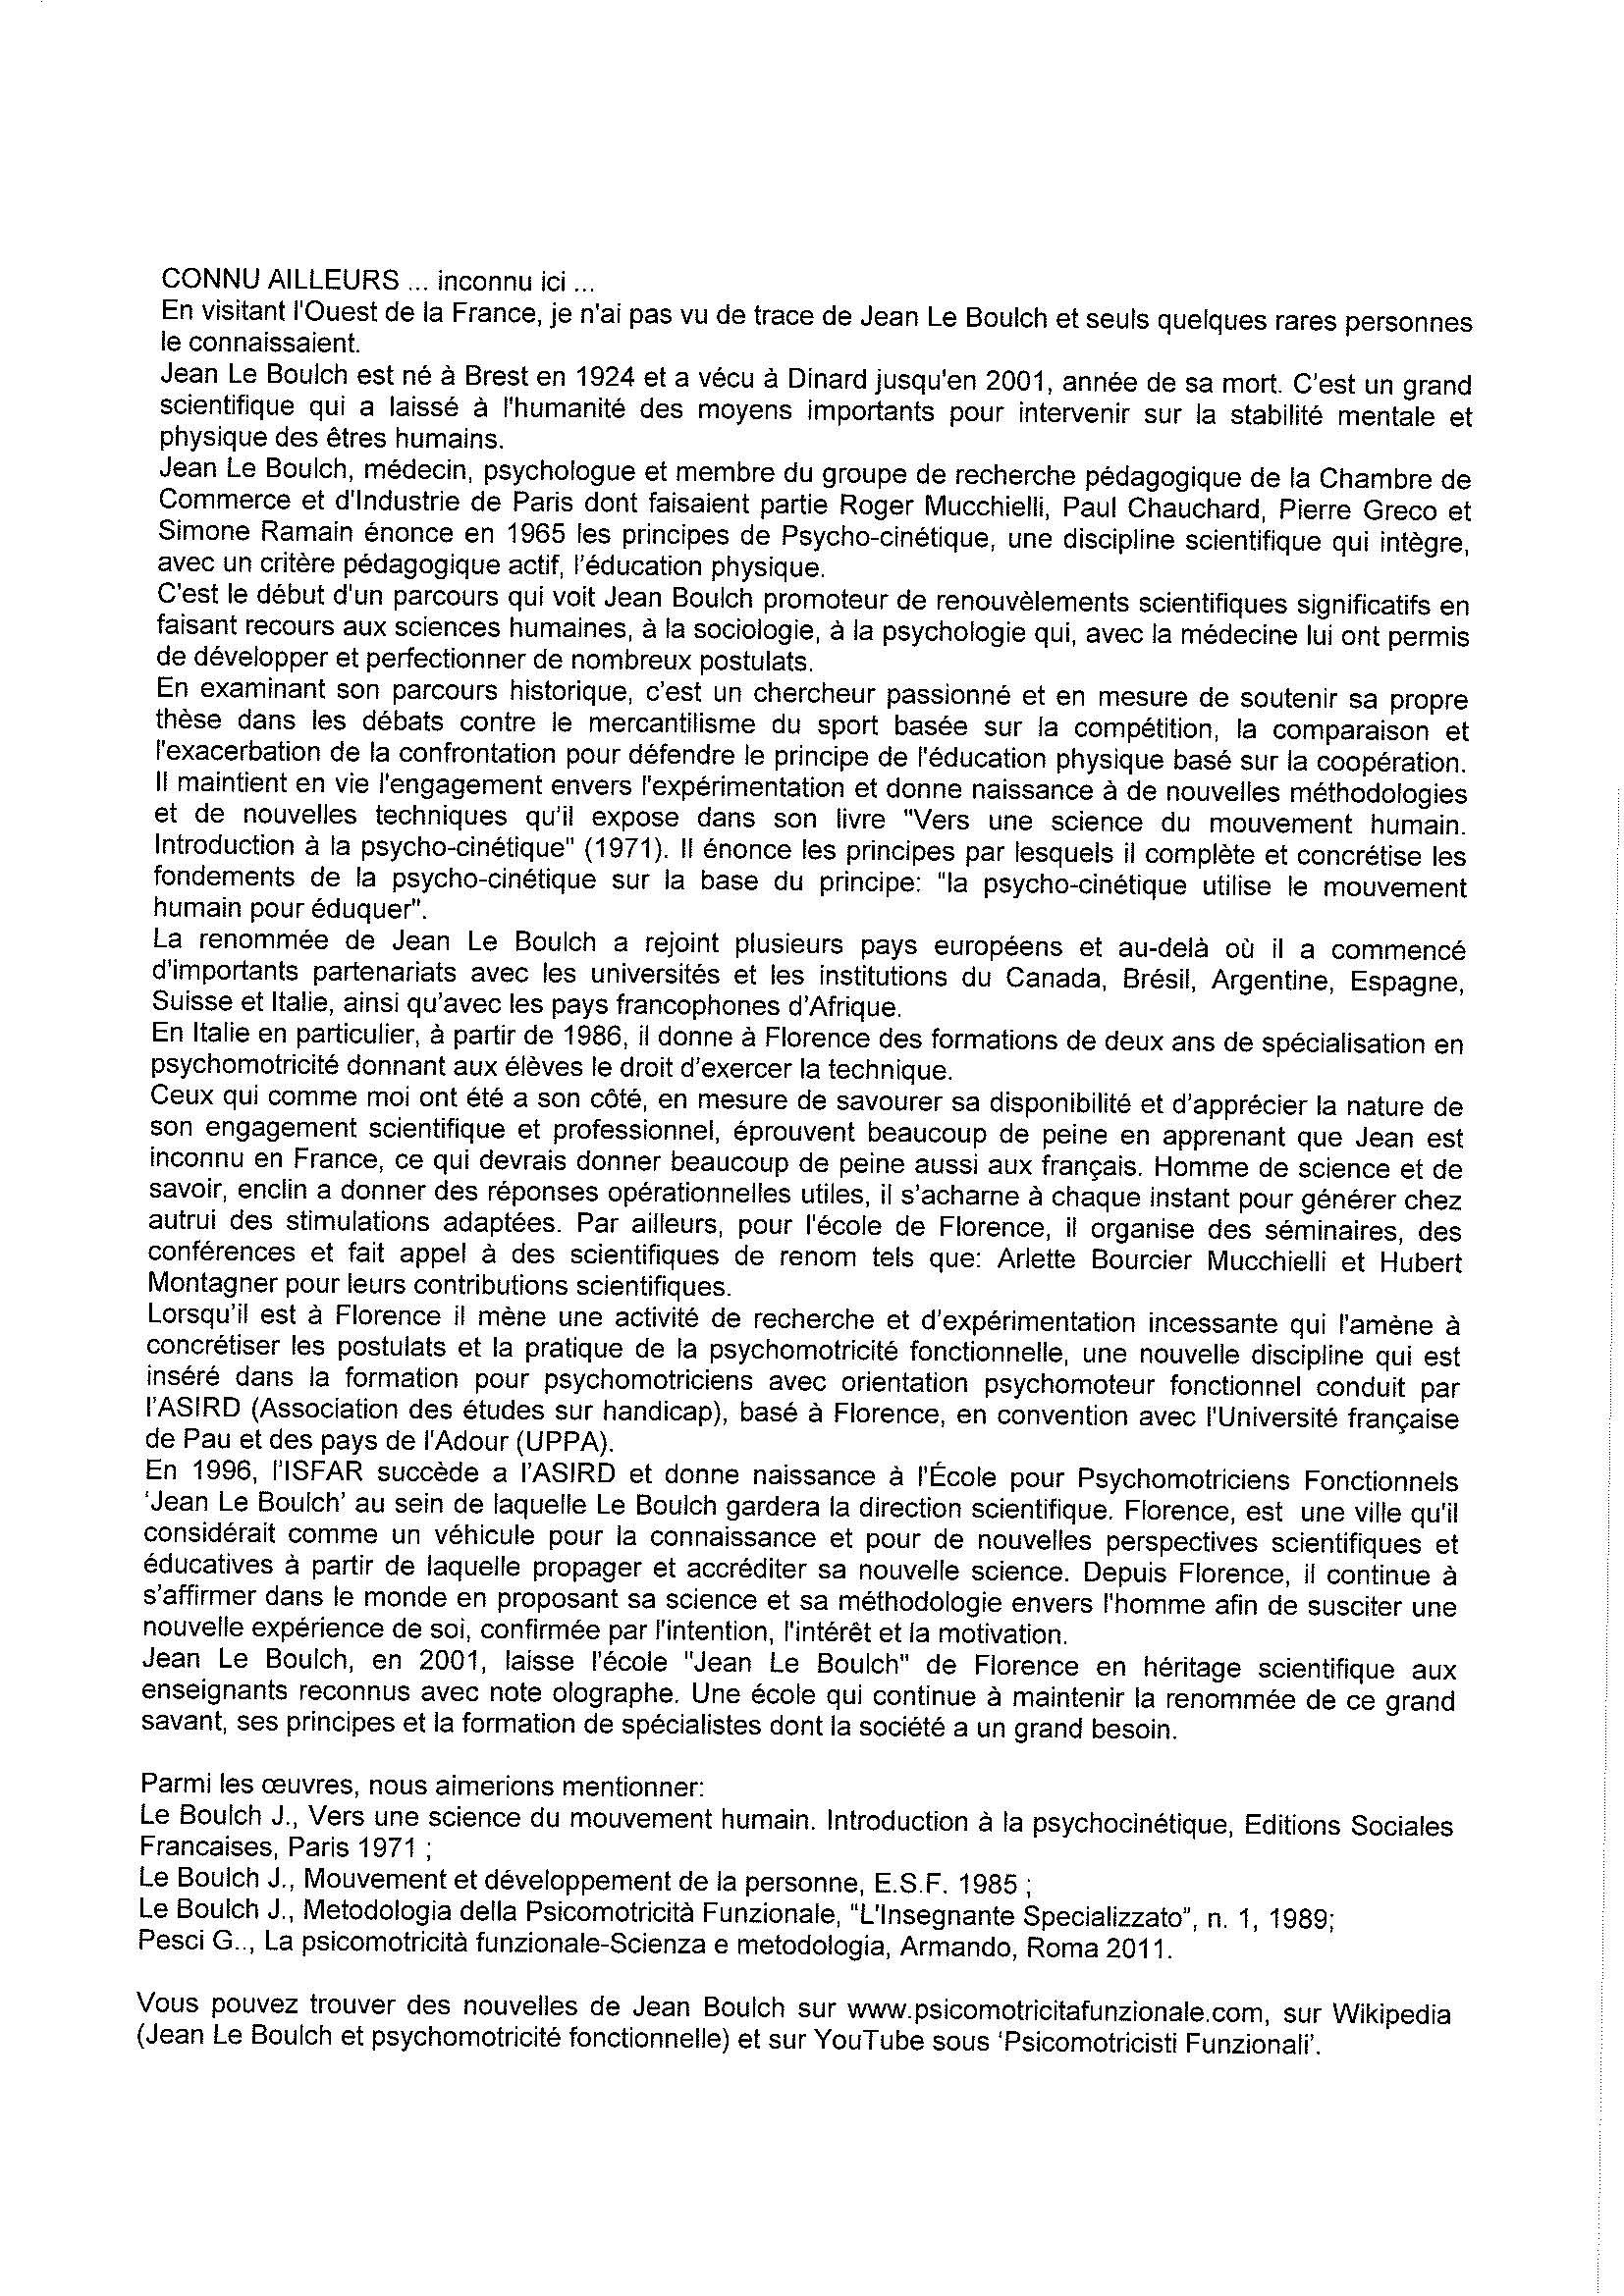 LETTRE A QUEST-FRANCE_Pagina_2